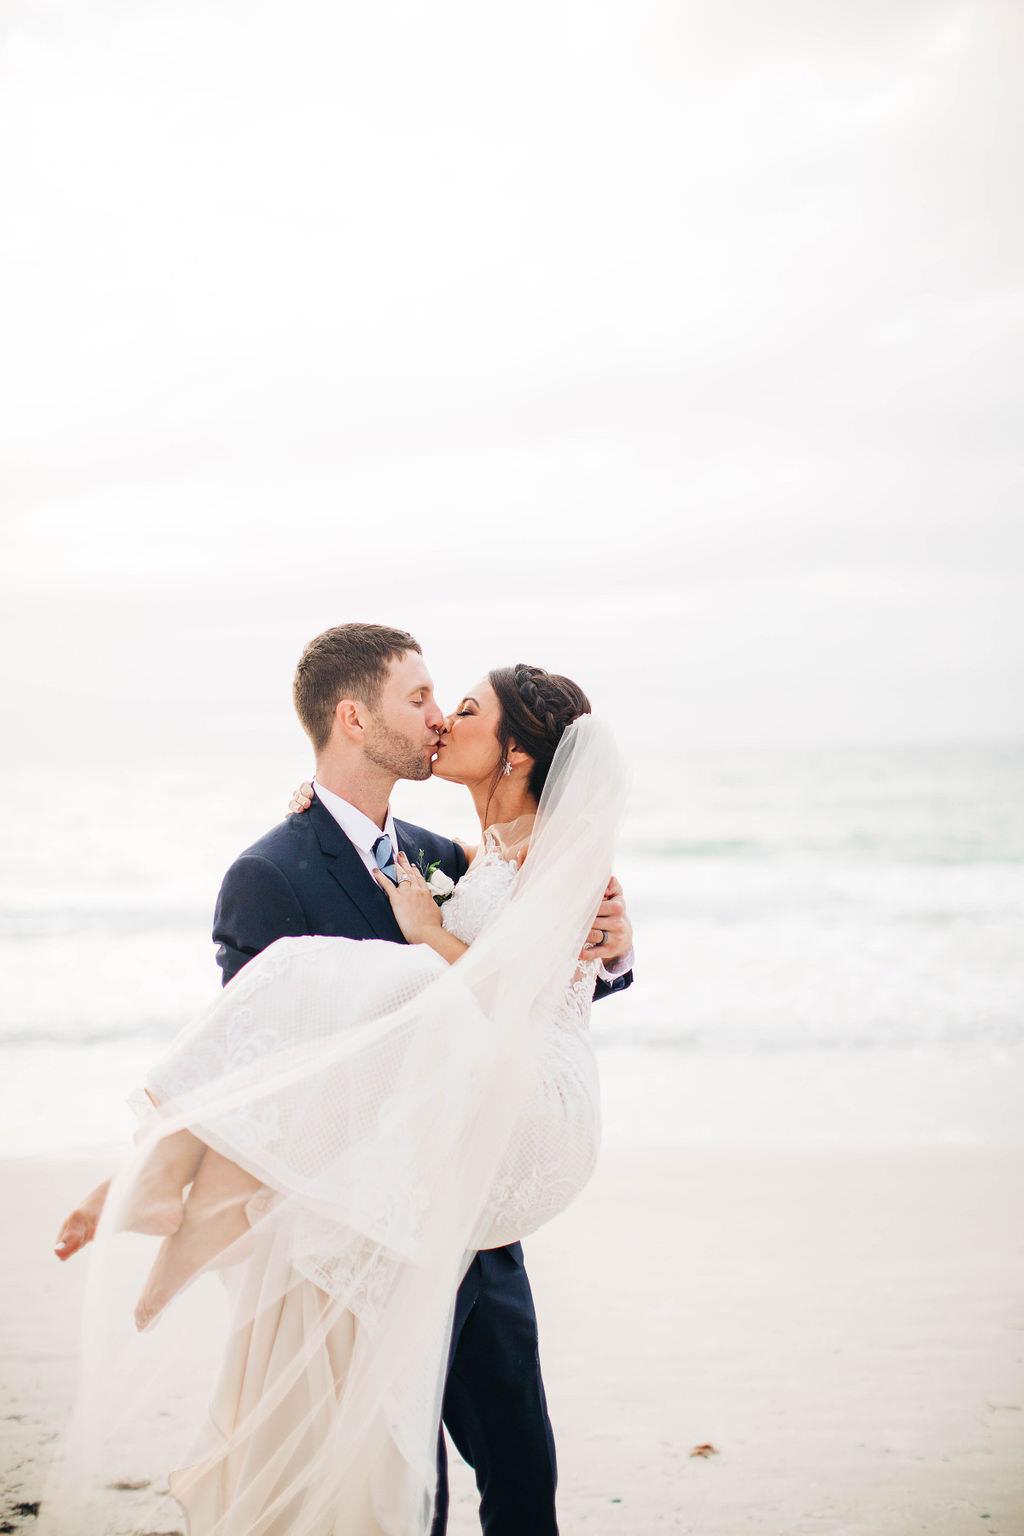 Clearwater Beach Bride and Groom Beachfront Wedding Portrait